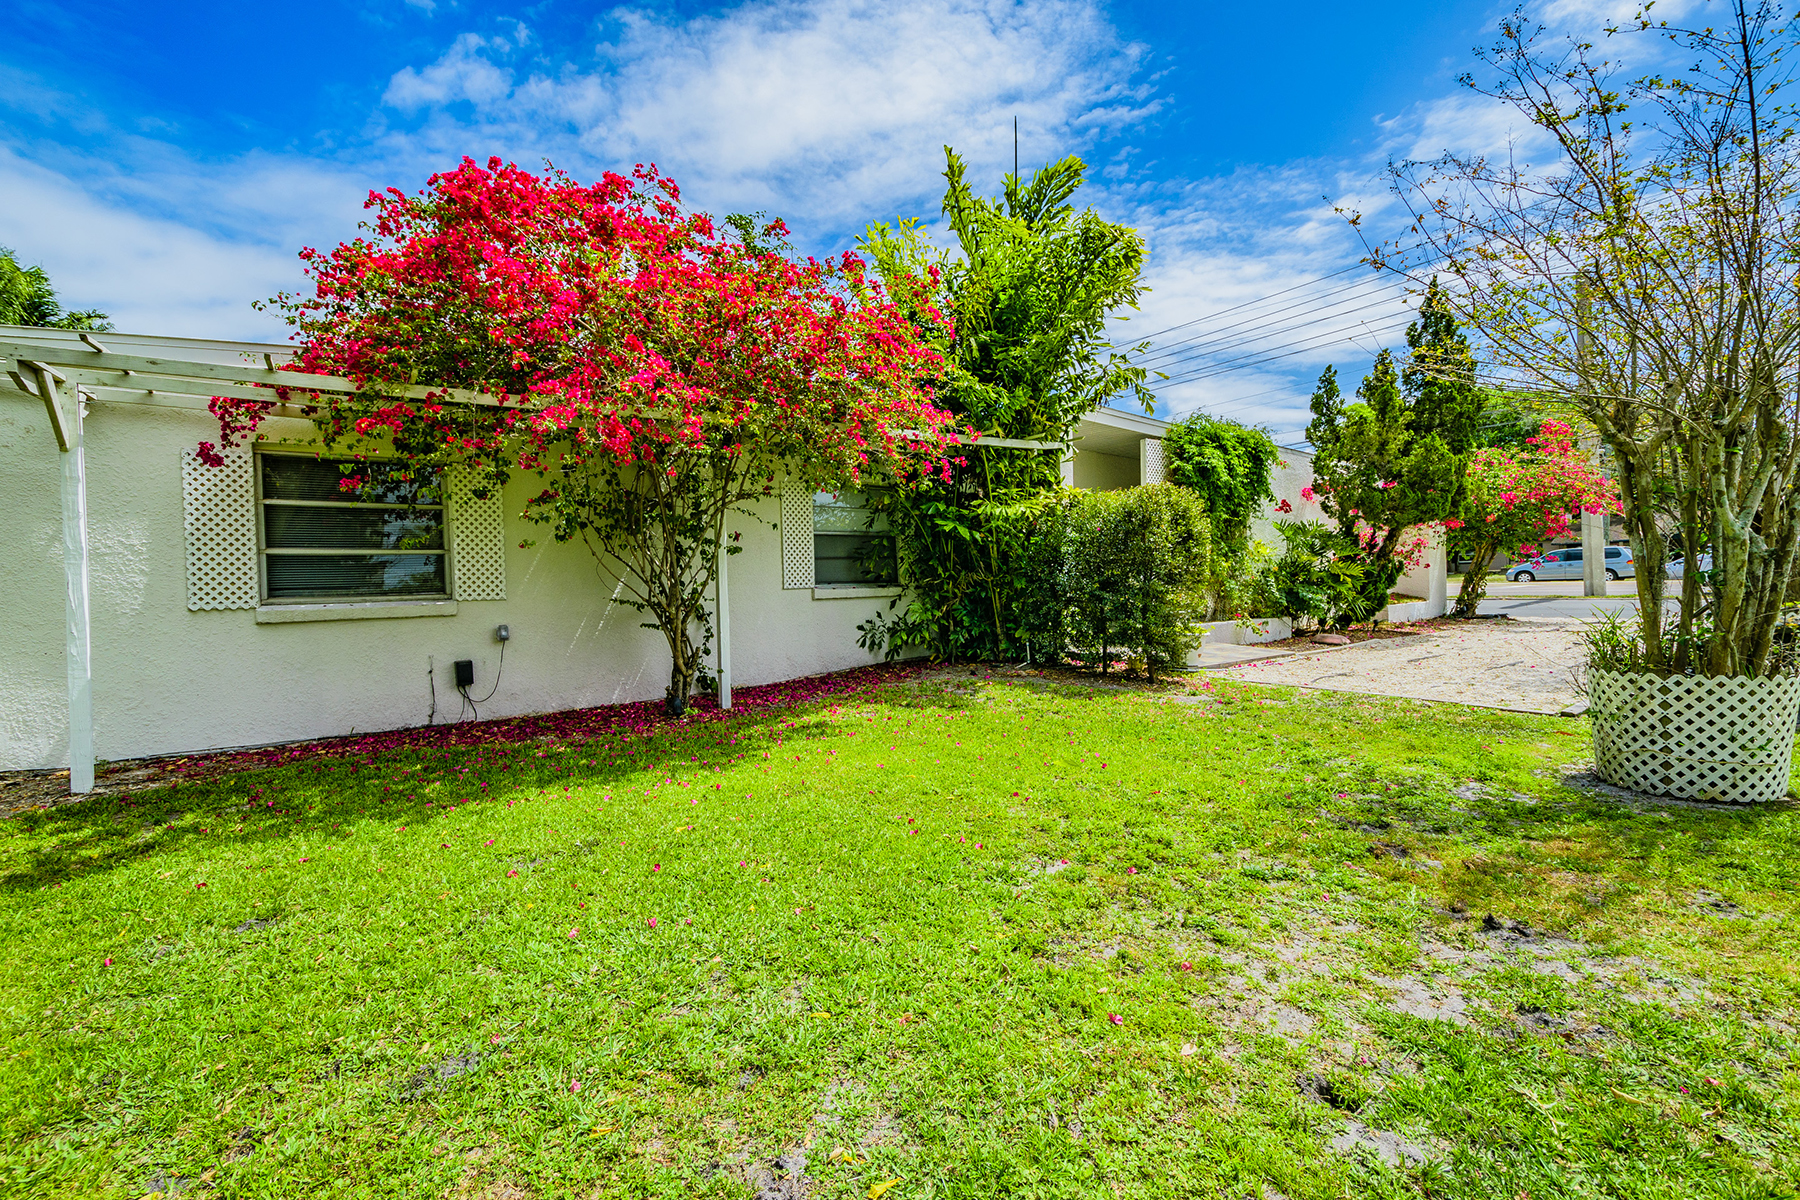 独户住宅 为 销售 在 504 Balfour Dr , Winter Park, FL 32792 504 Balfour Dr 温特帕克, 佛罗里达州, 32792 美国